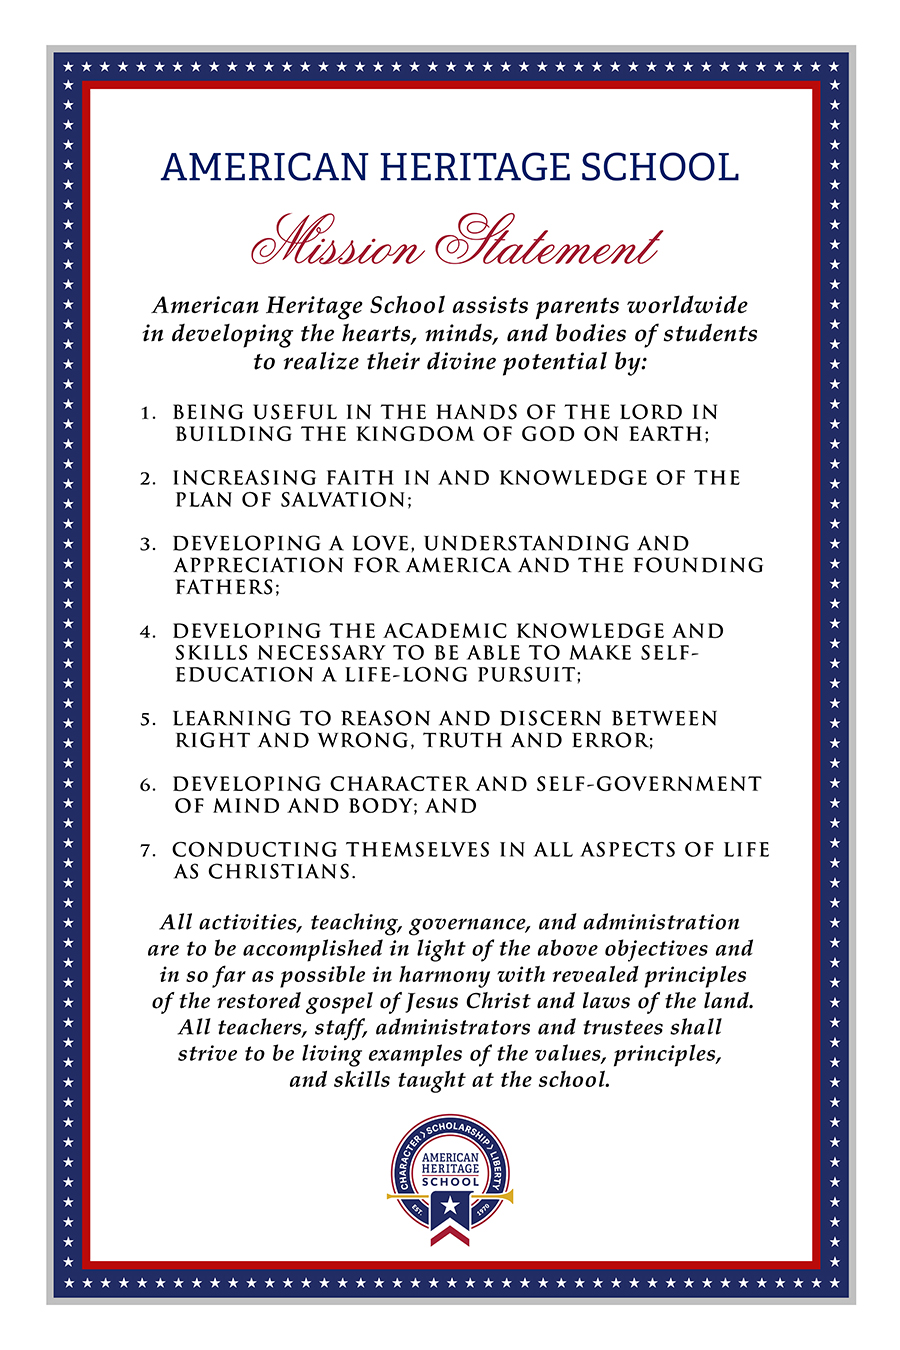 Mission Statement American Heritage School